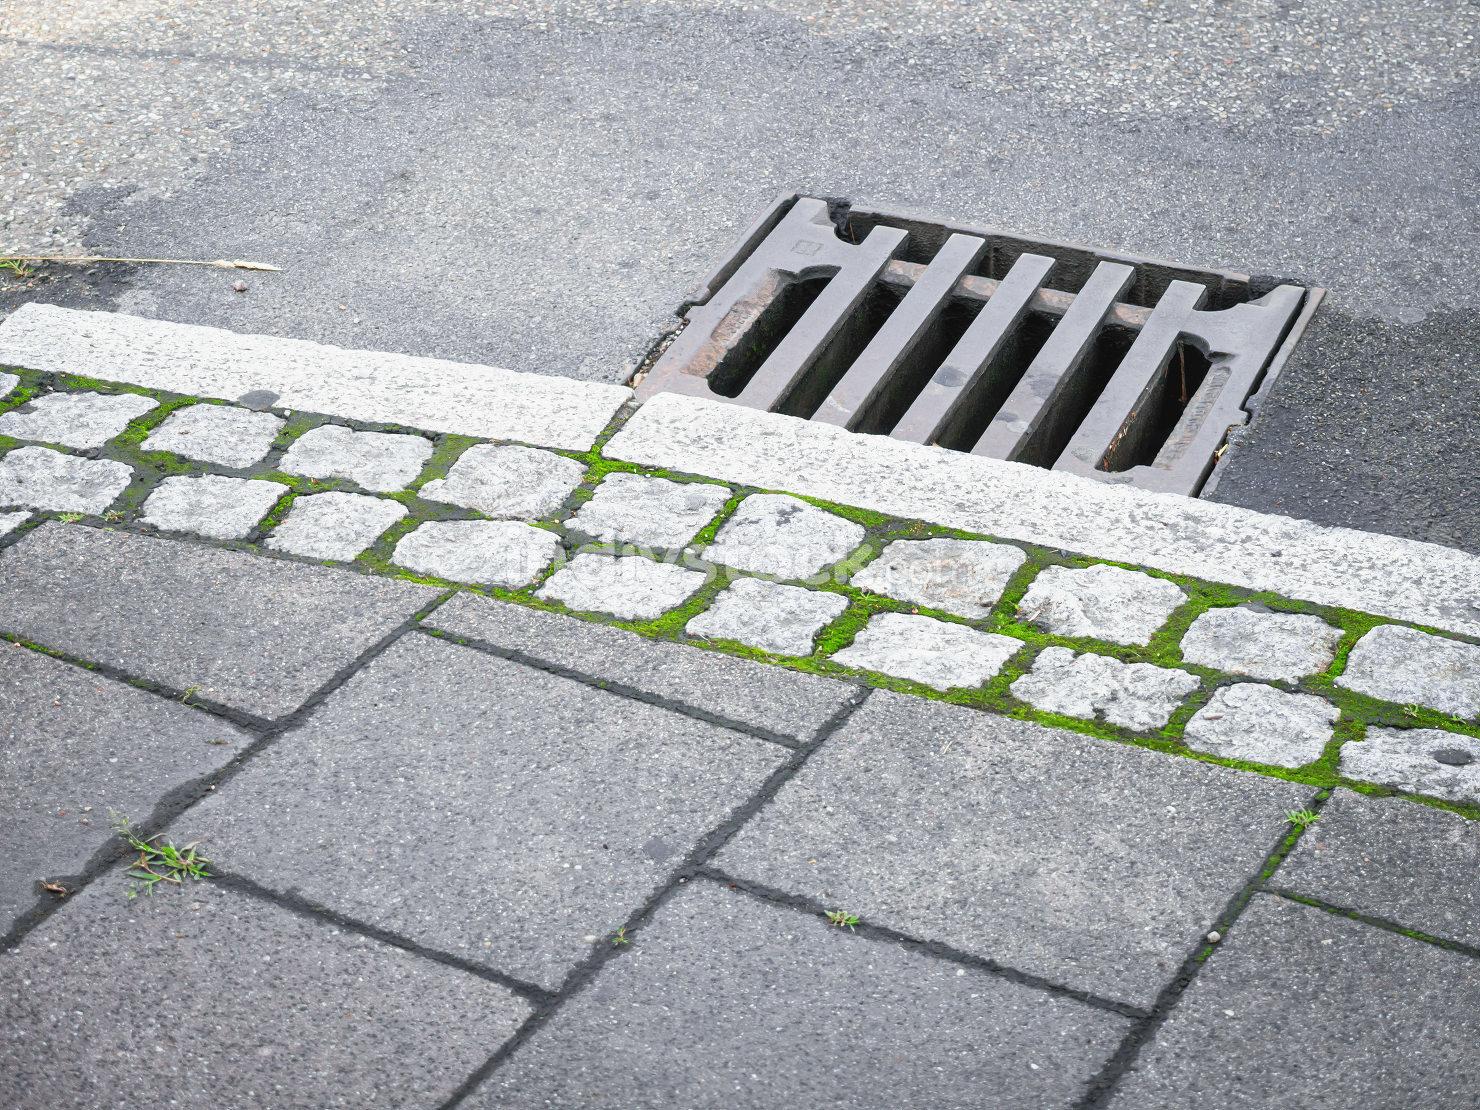 manhole cover Germany